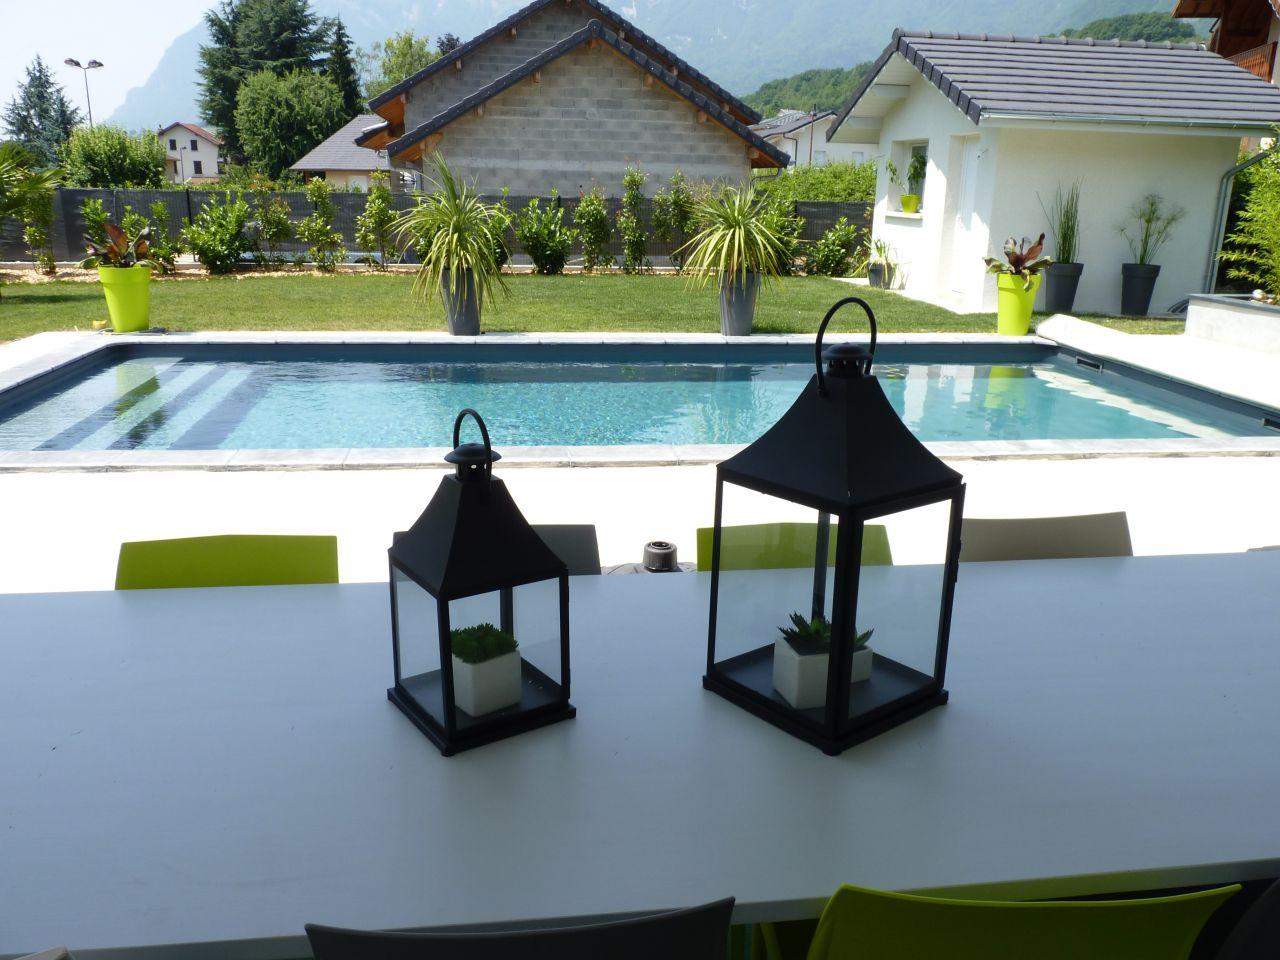 Piscine blocs à bancher - Savoie (73) - juillet 2015